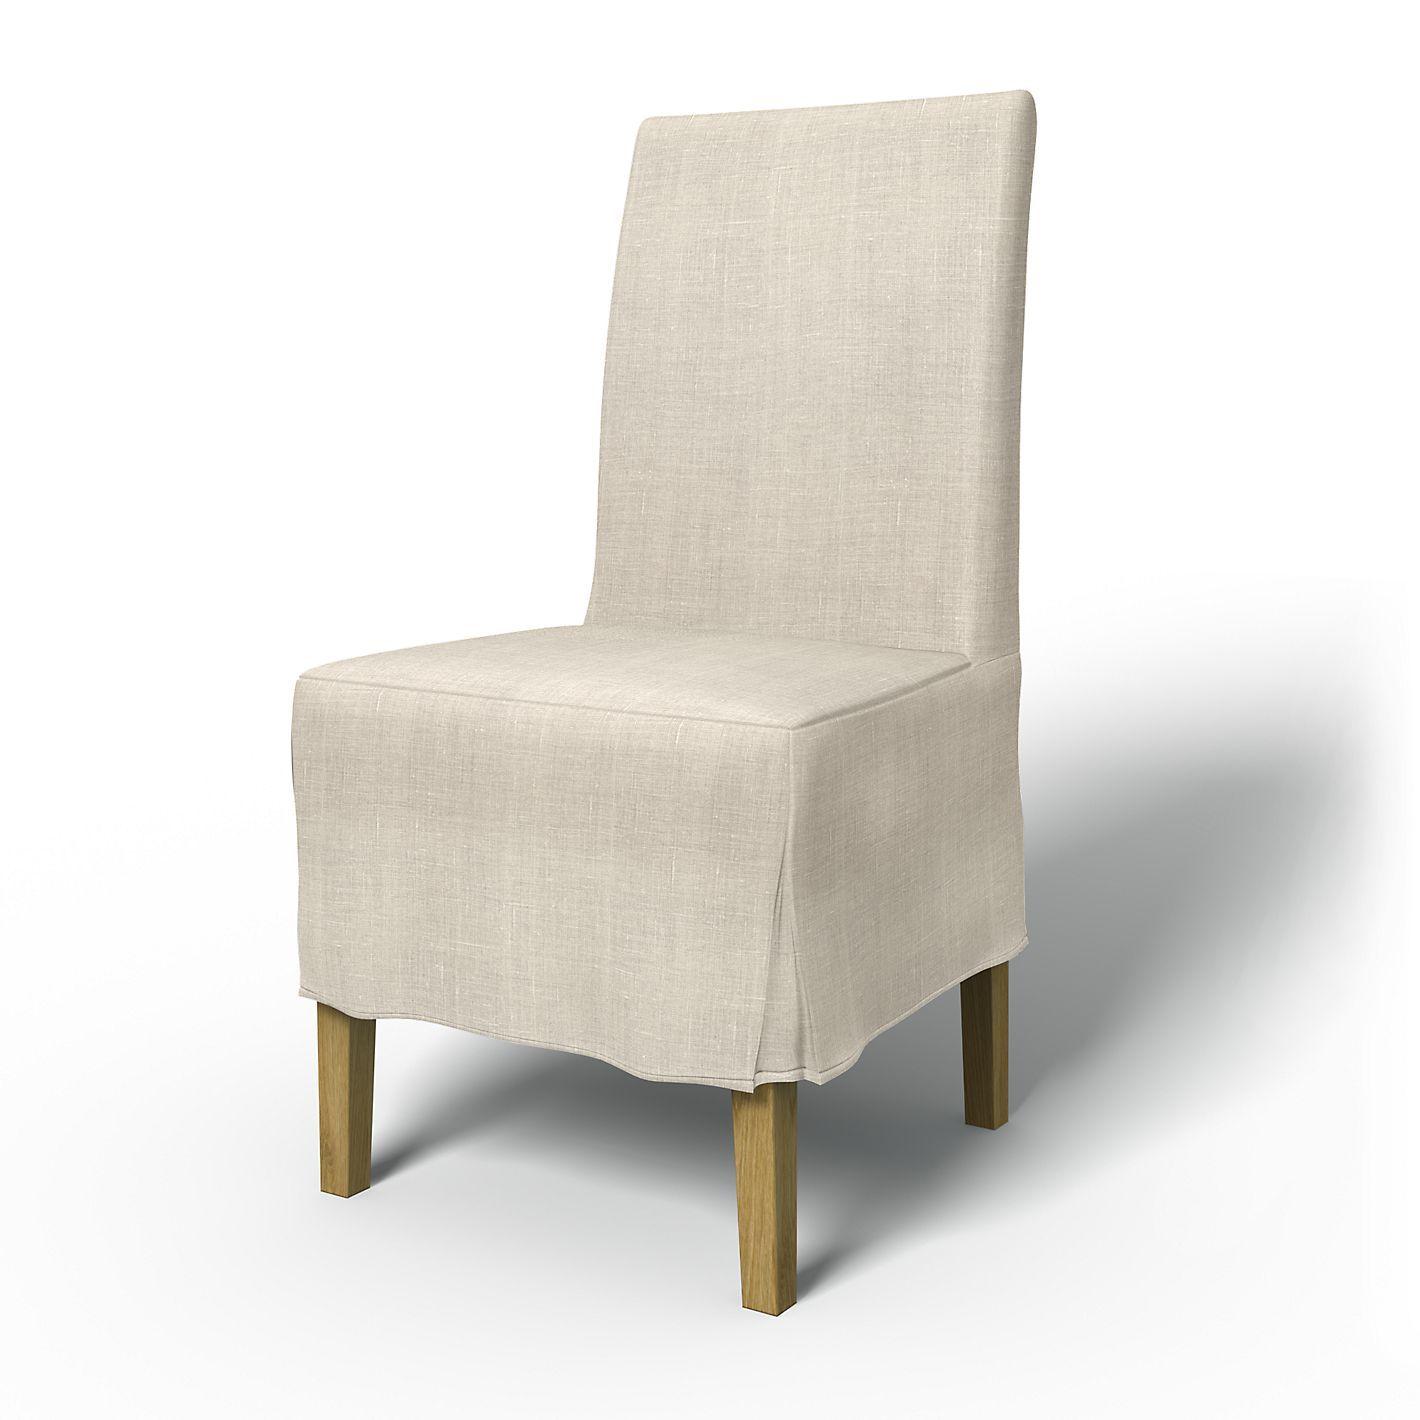 Sensational Henriksdal Chair Cover Medium Long With Box Pleat Dining Inzonedesignstudio Interior Chair Design Inzonedesignstudiocom